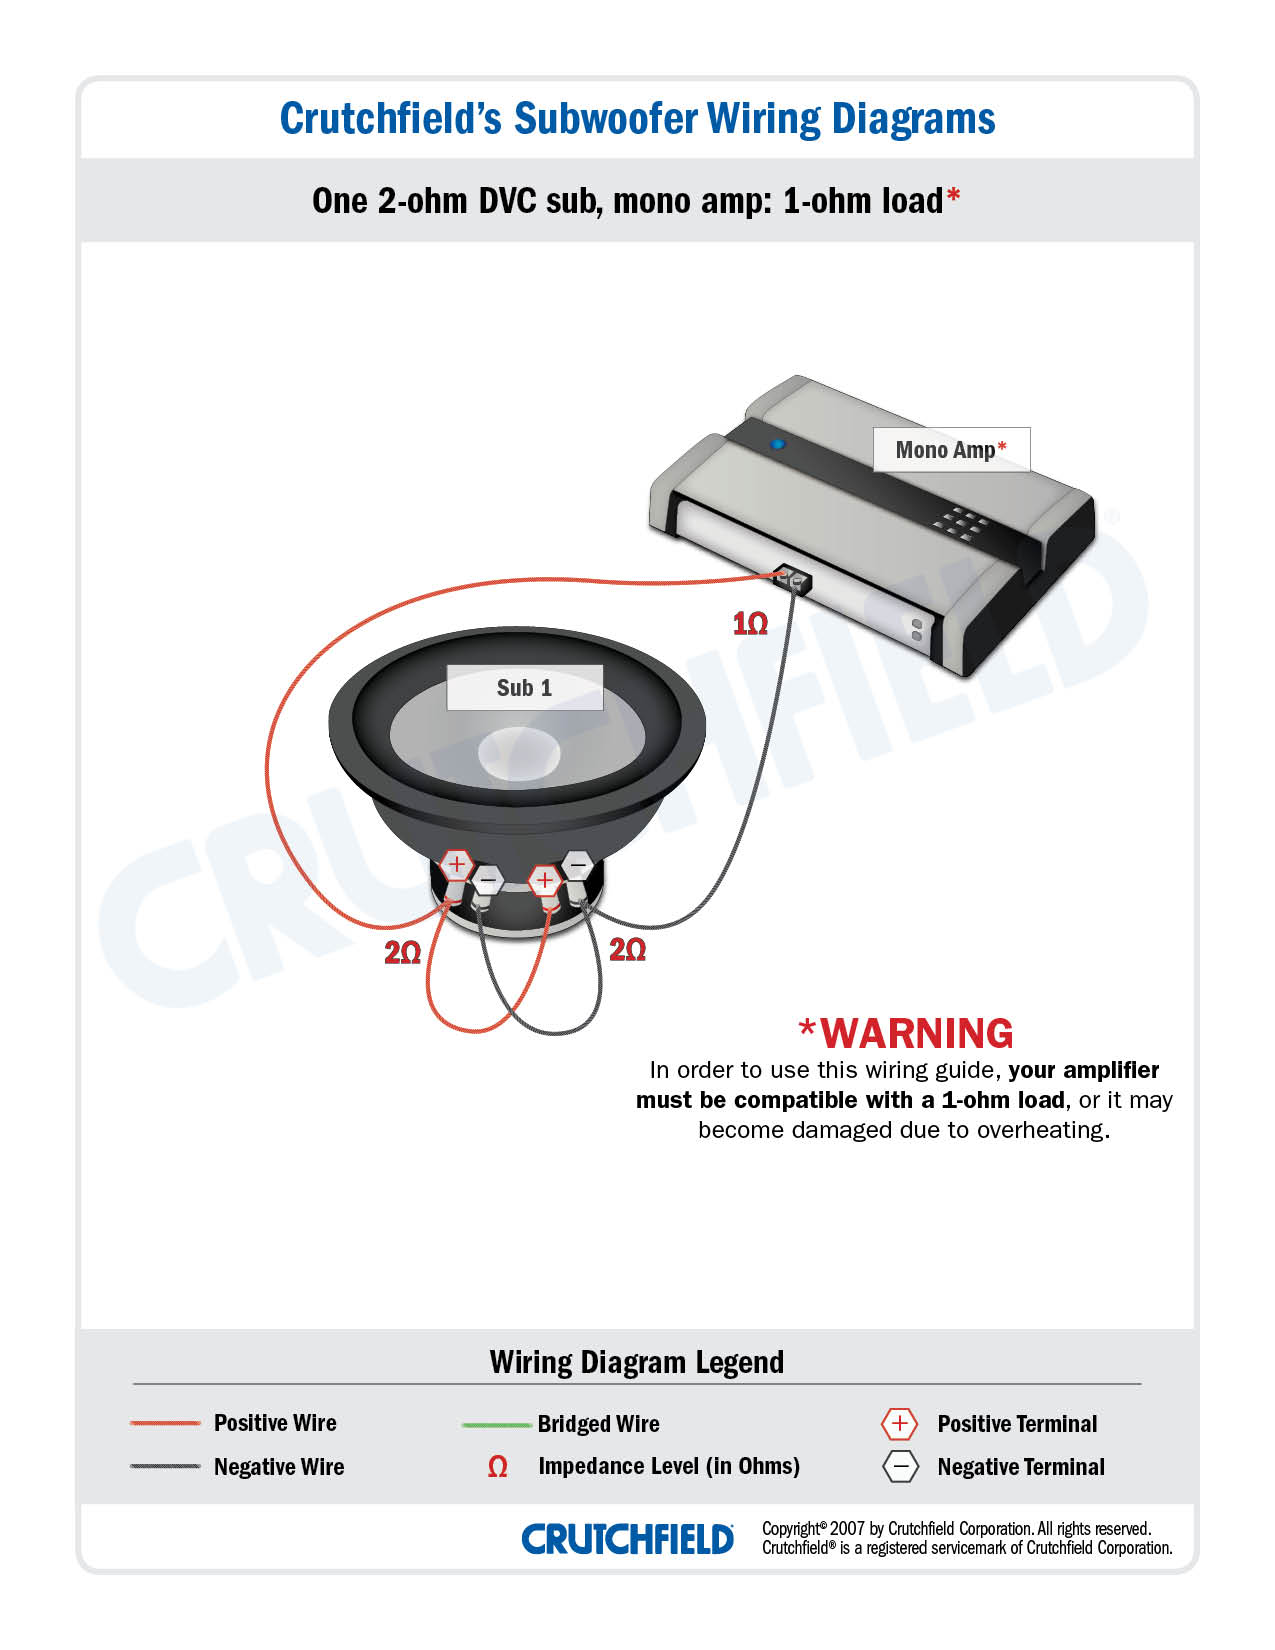 Subwoofer Wiring Diagram Dual 2 Ohm